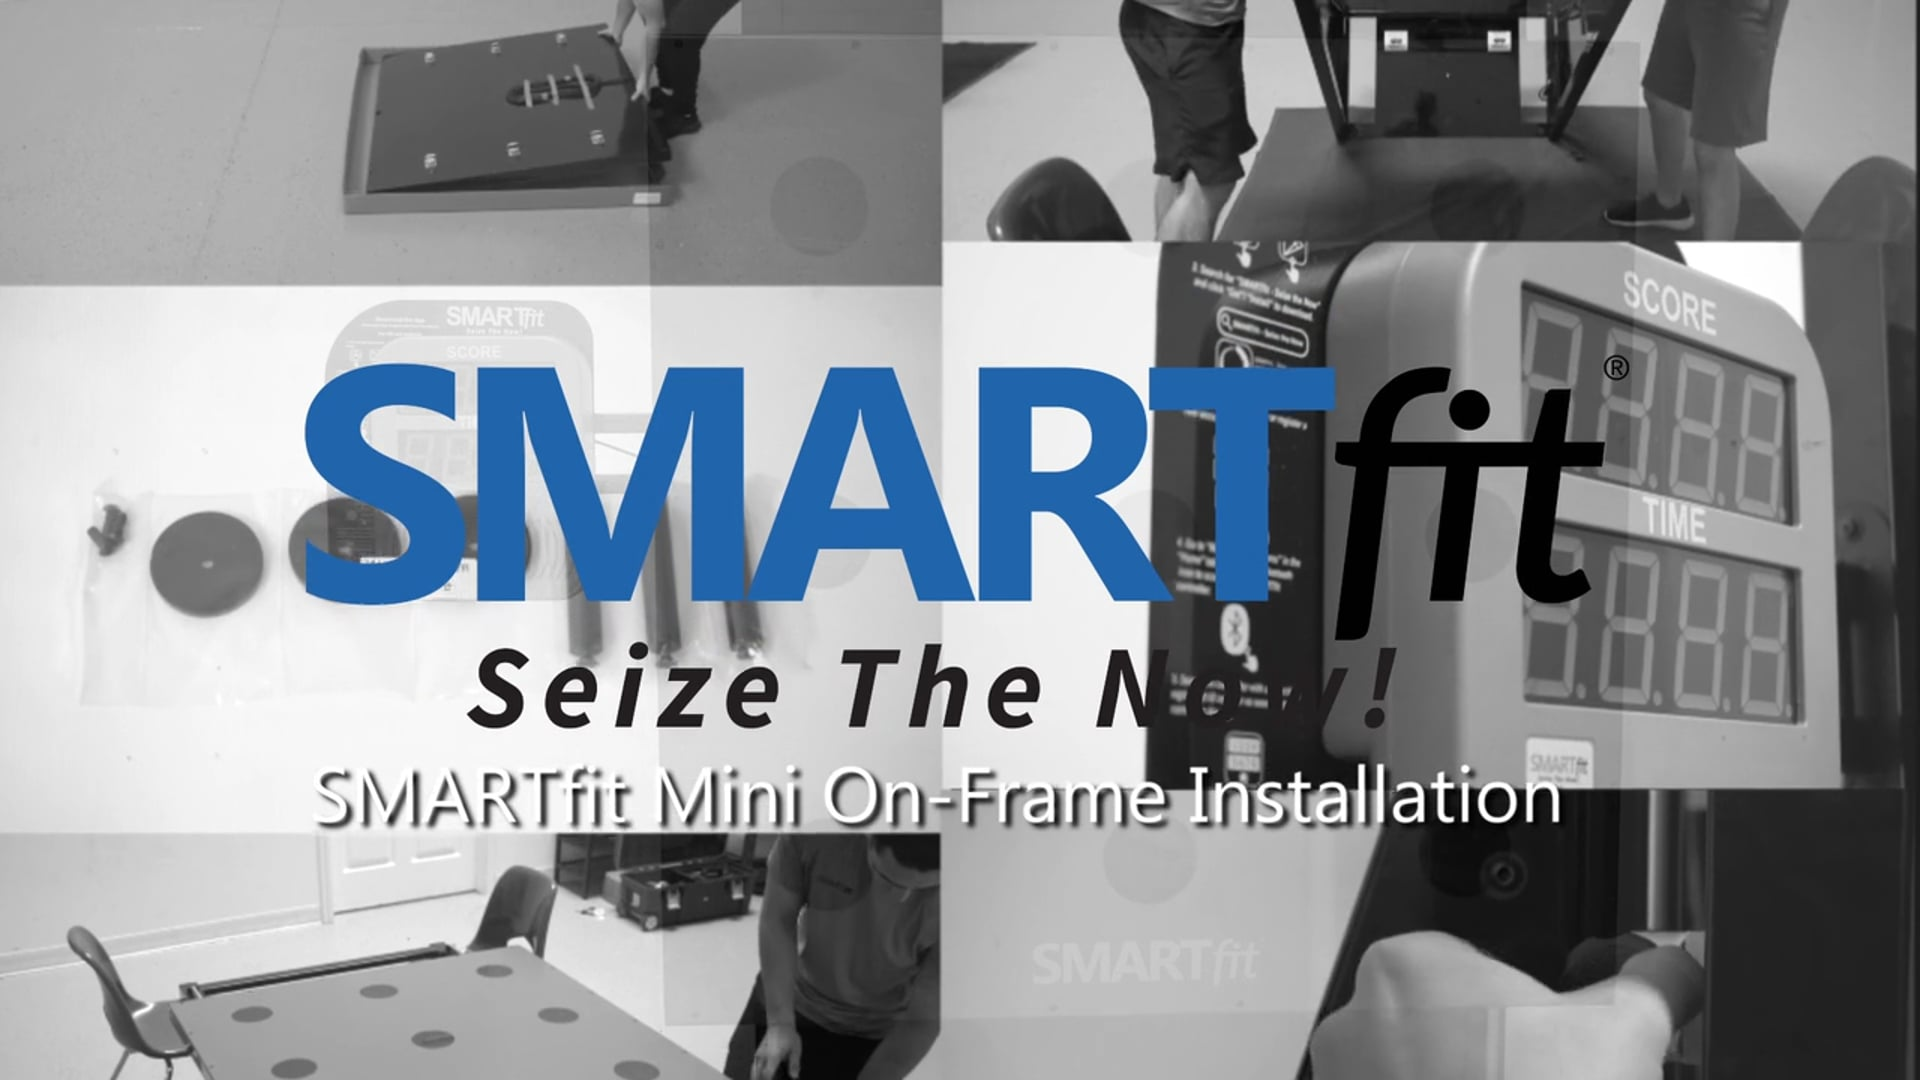 SMARTfit installation and setup videos